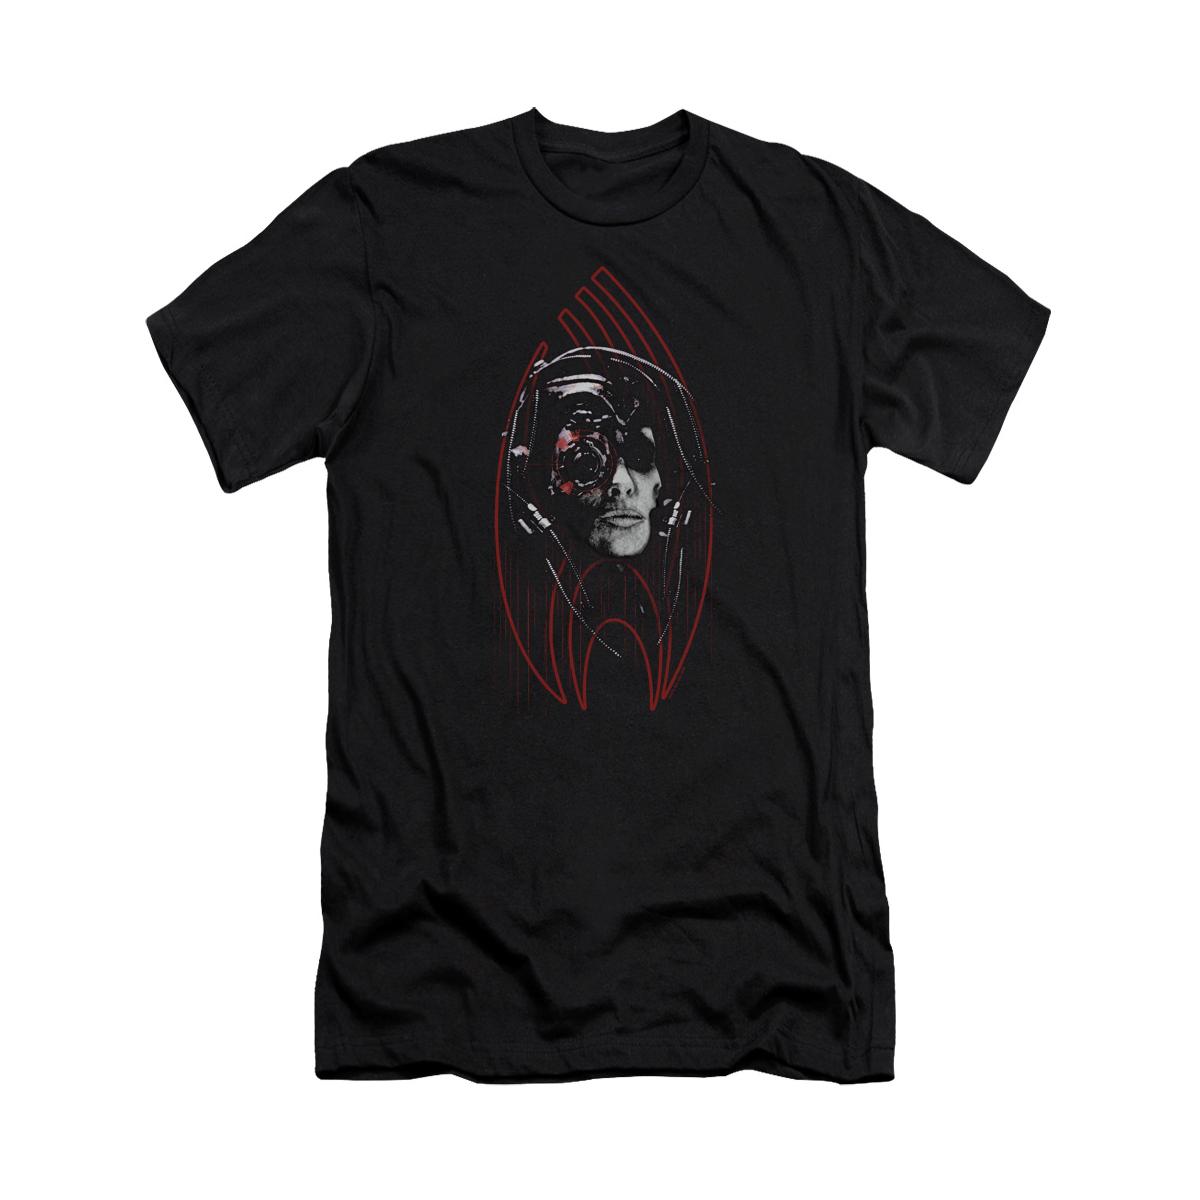 Star Trek The Next Generation Borg Contruct T-Shirt